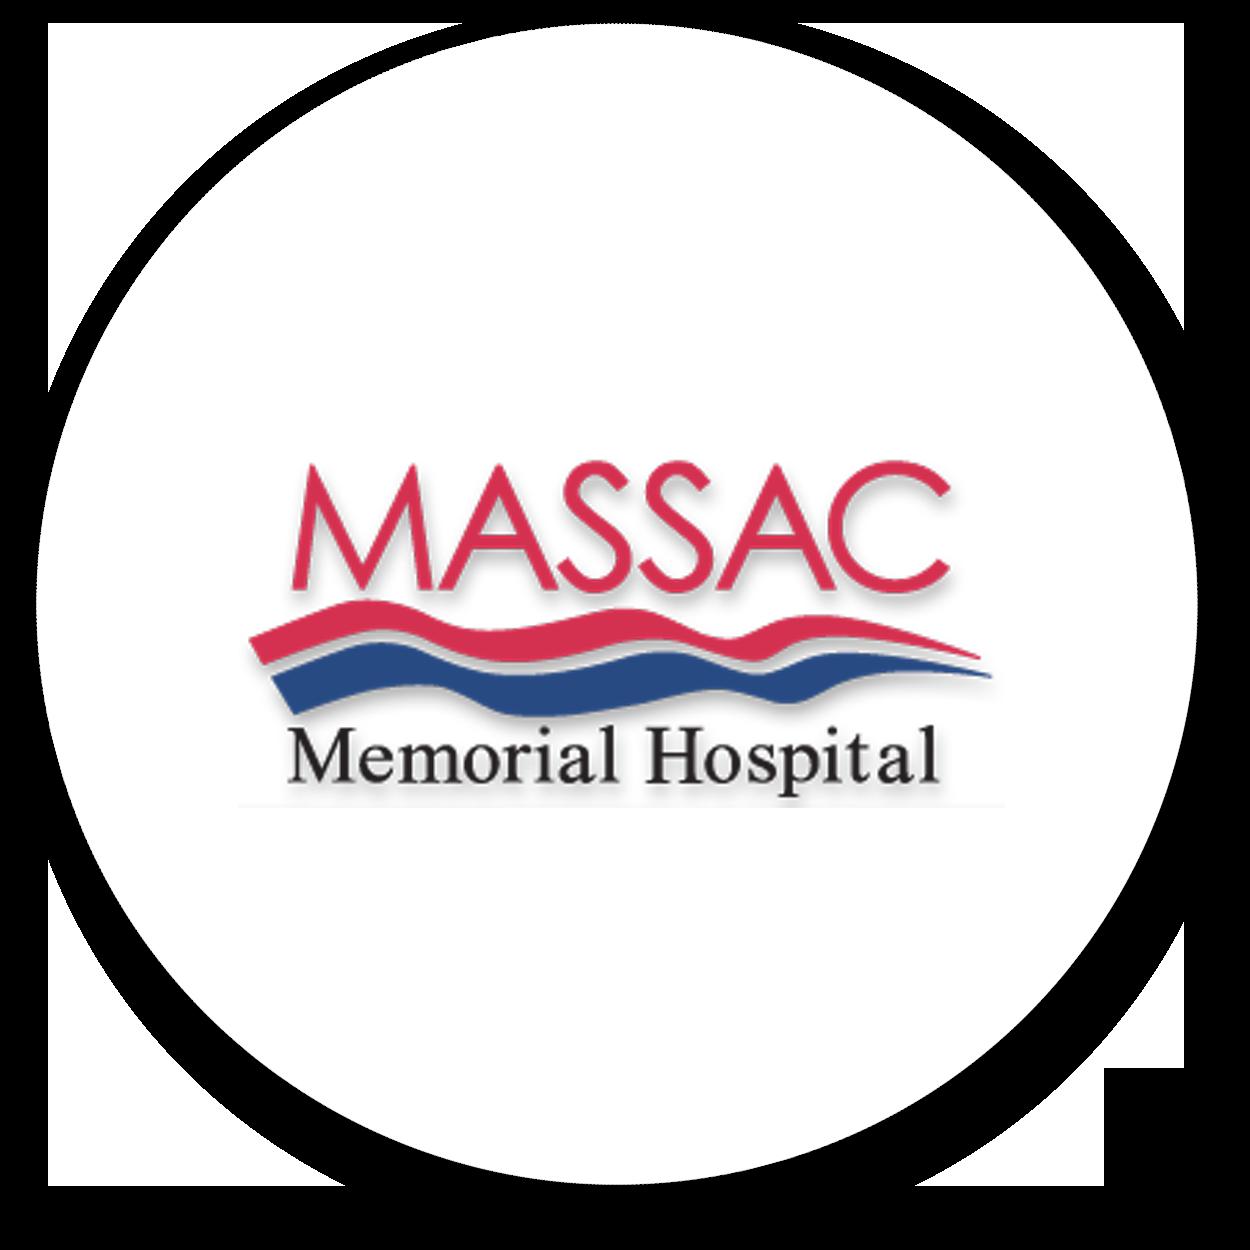 Massac Memorial Hospital